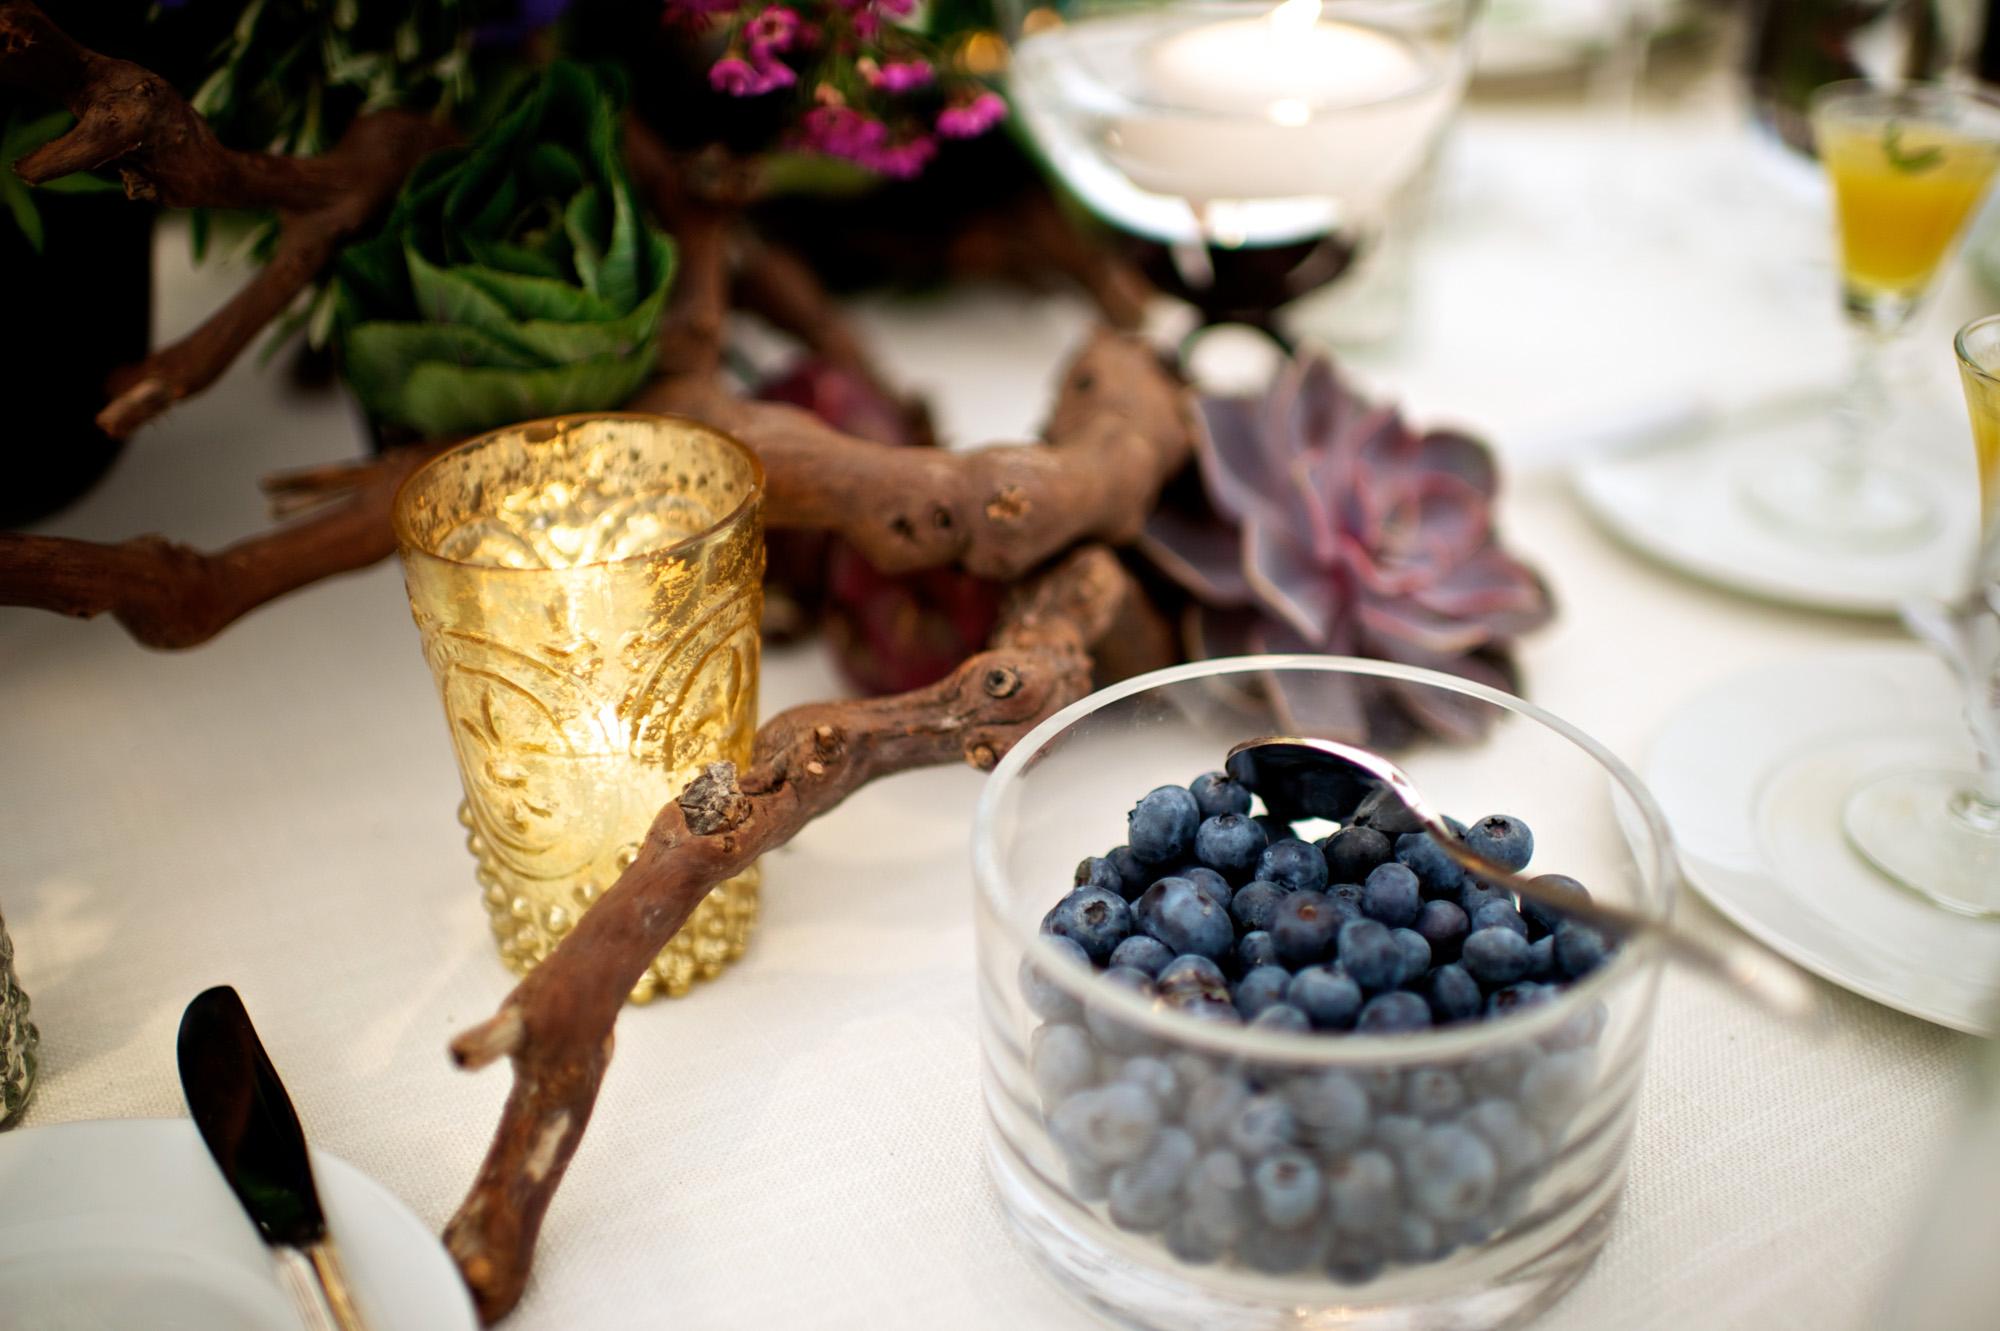 birch-bespoke-events-and-weddings-18.jpg